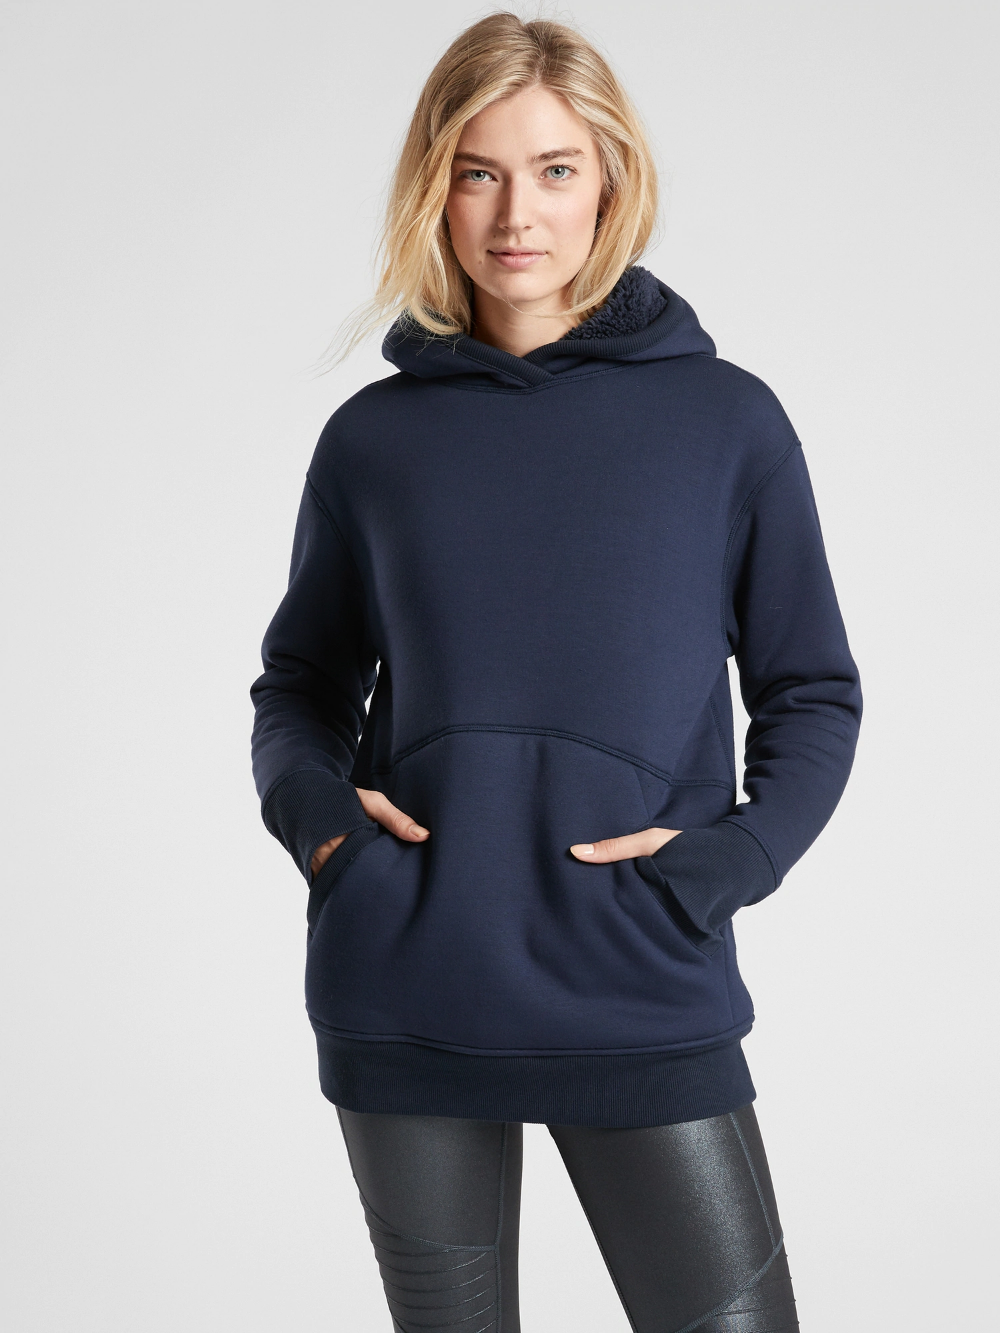 Reversible Sherpa Sweatshirt Athleta Sherpa Sweatshirt Sweatshirts Fashion [ 1333 x 1000 Pixel ]